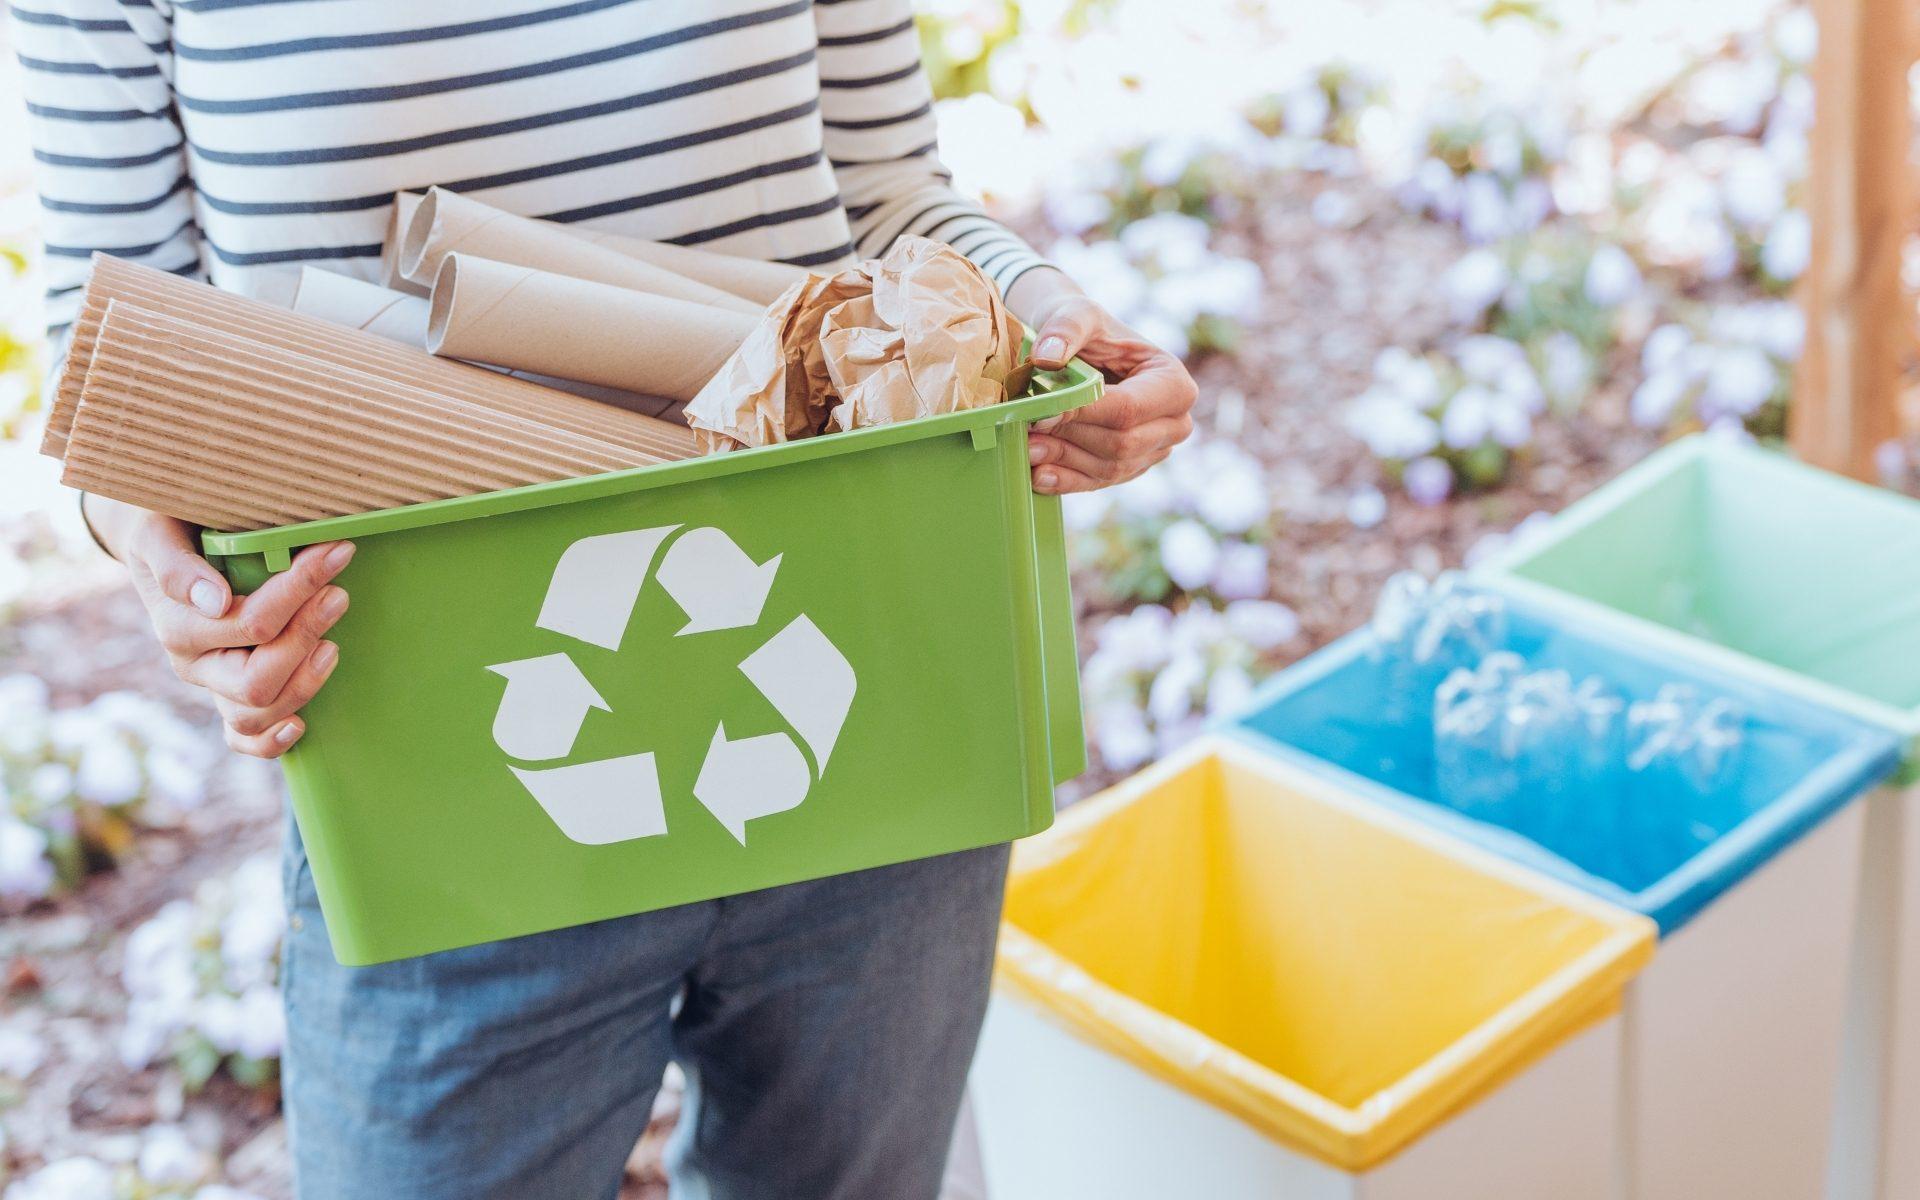 A woman recycling cardboard